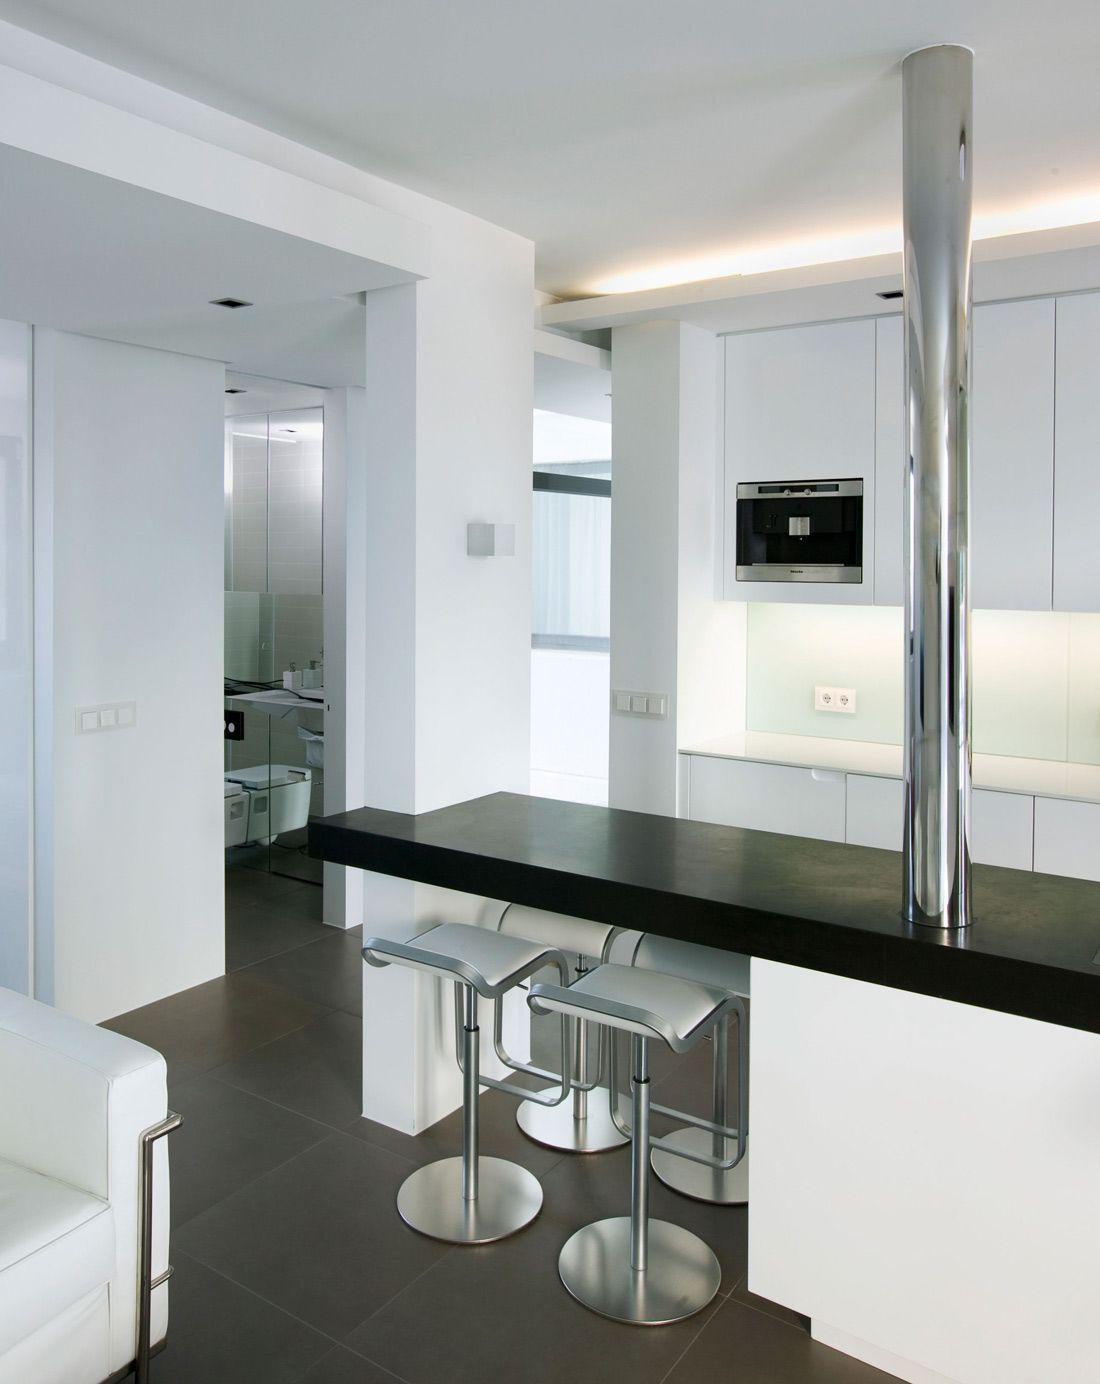 Dining Table Kitchen Island Modern Apartment In Reykjavik